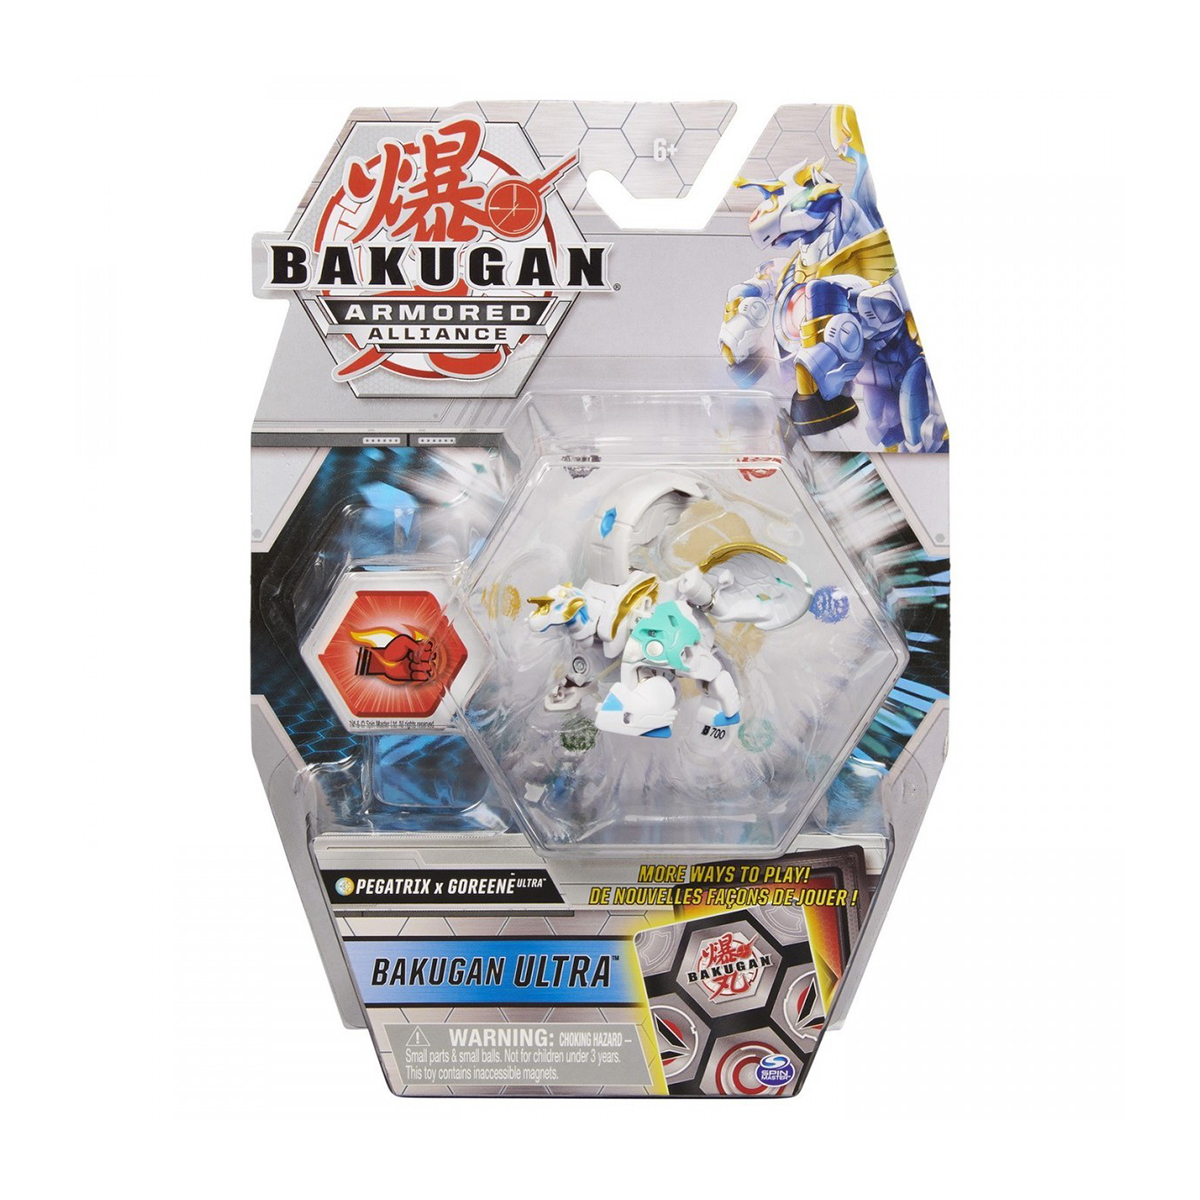 Figurina Bakugan Ultra Armored Alliance, Pegatrix x Goreene, 20124617